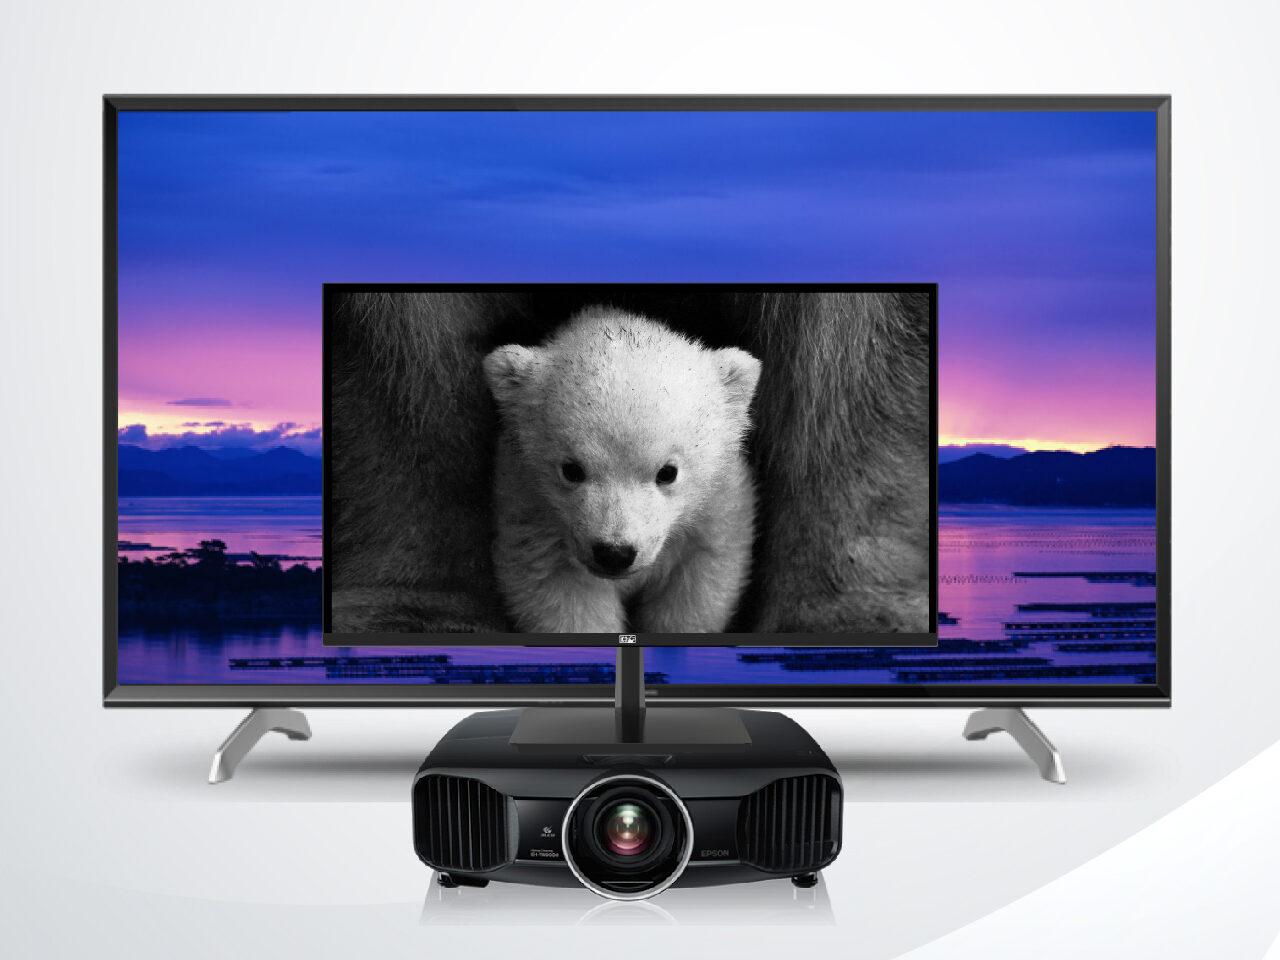 http://grupofixon.com/wp-content/uploads/2021/06/productos-01-1-1280x960.jpg